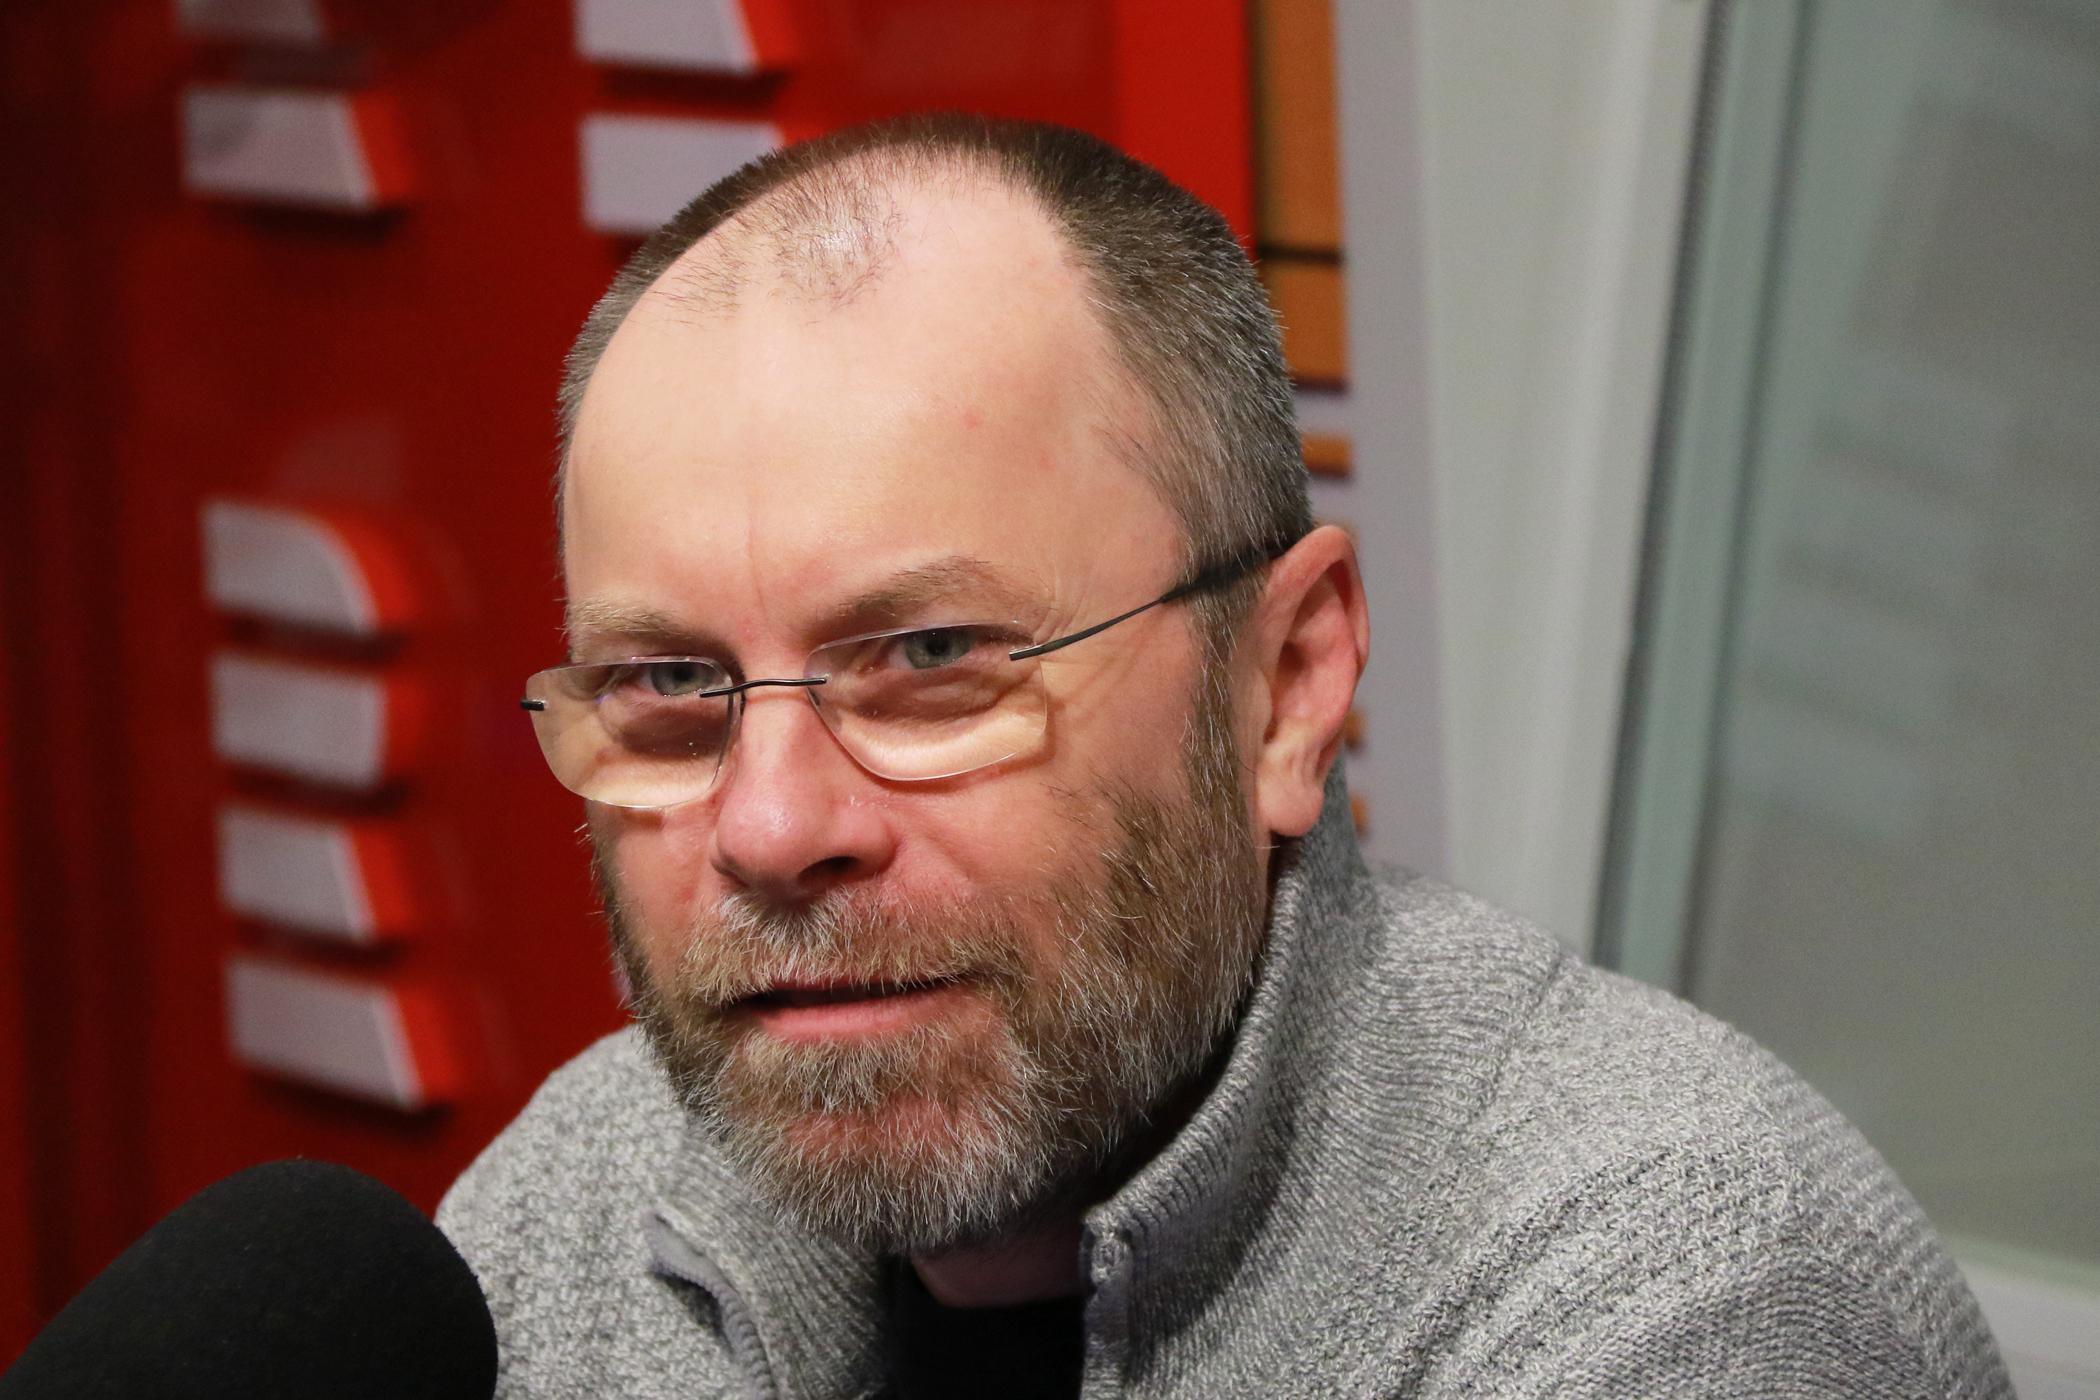 JUDr. Tibor Nyitray, ředitel Svazu vinařů